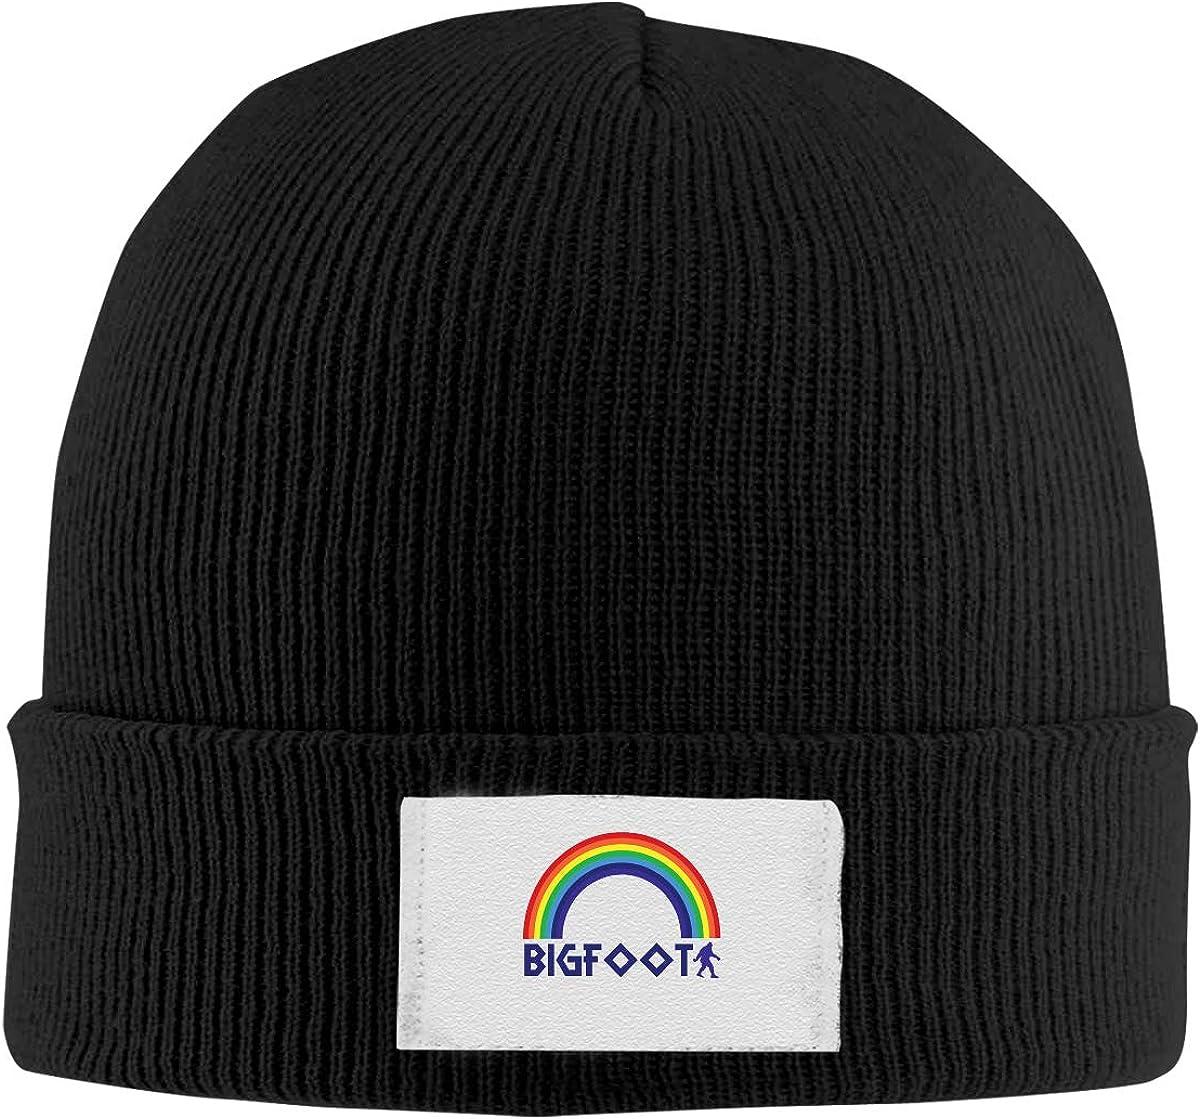 Z-YY Rainbow Bigfoot Unisex Winter Knitting Woolen Hat Warm Cap